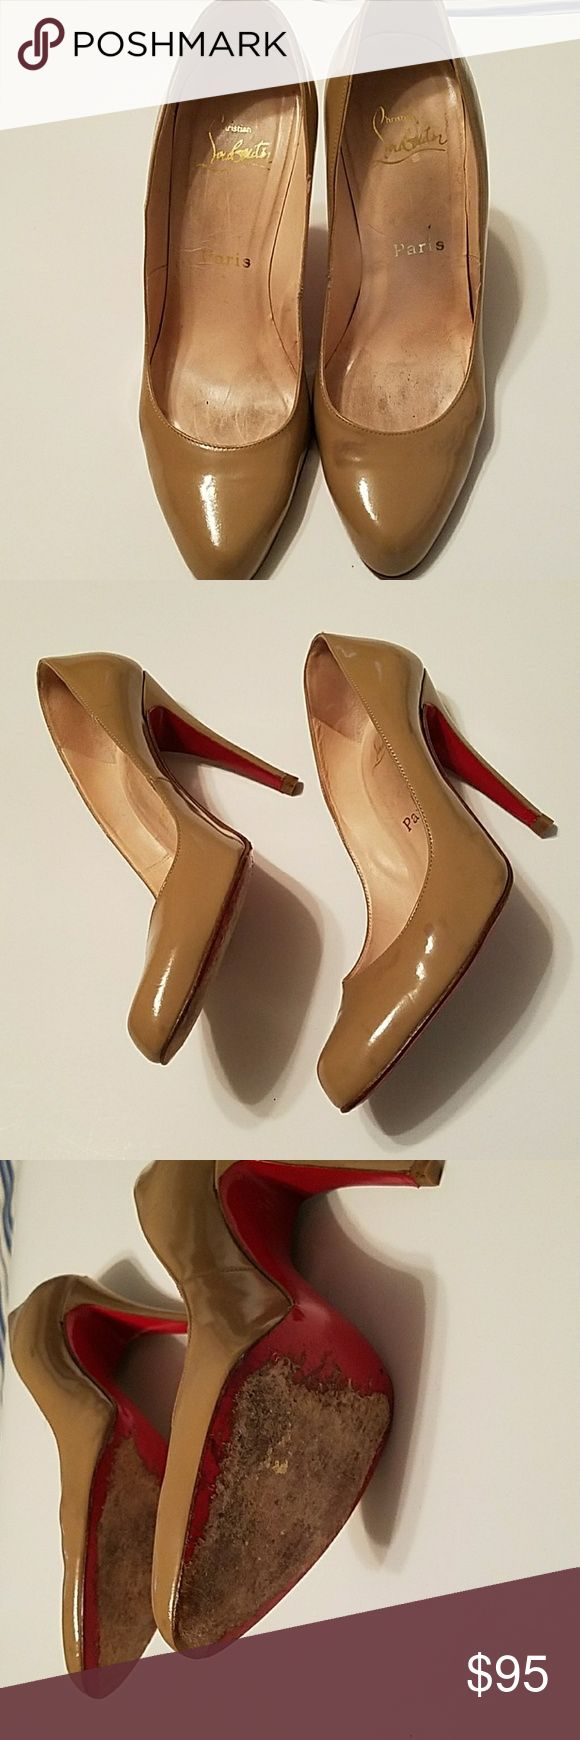 Christian Louboutin pumps Classic patent leather Christian Louboutin pumps Christian Louboutin Shoes Heels